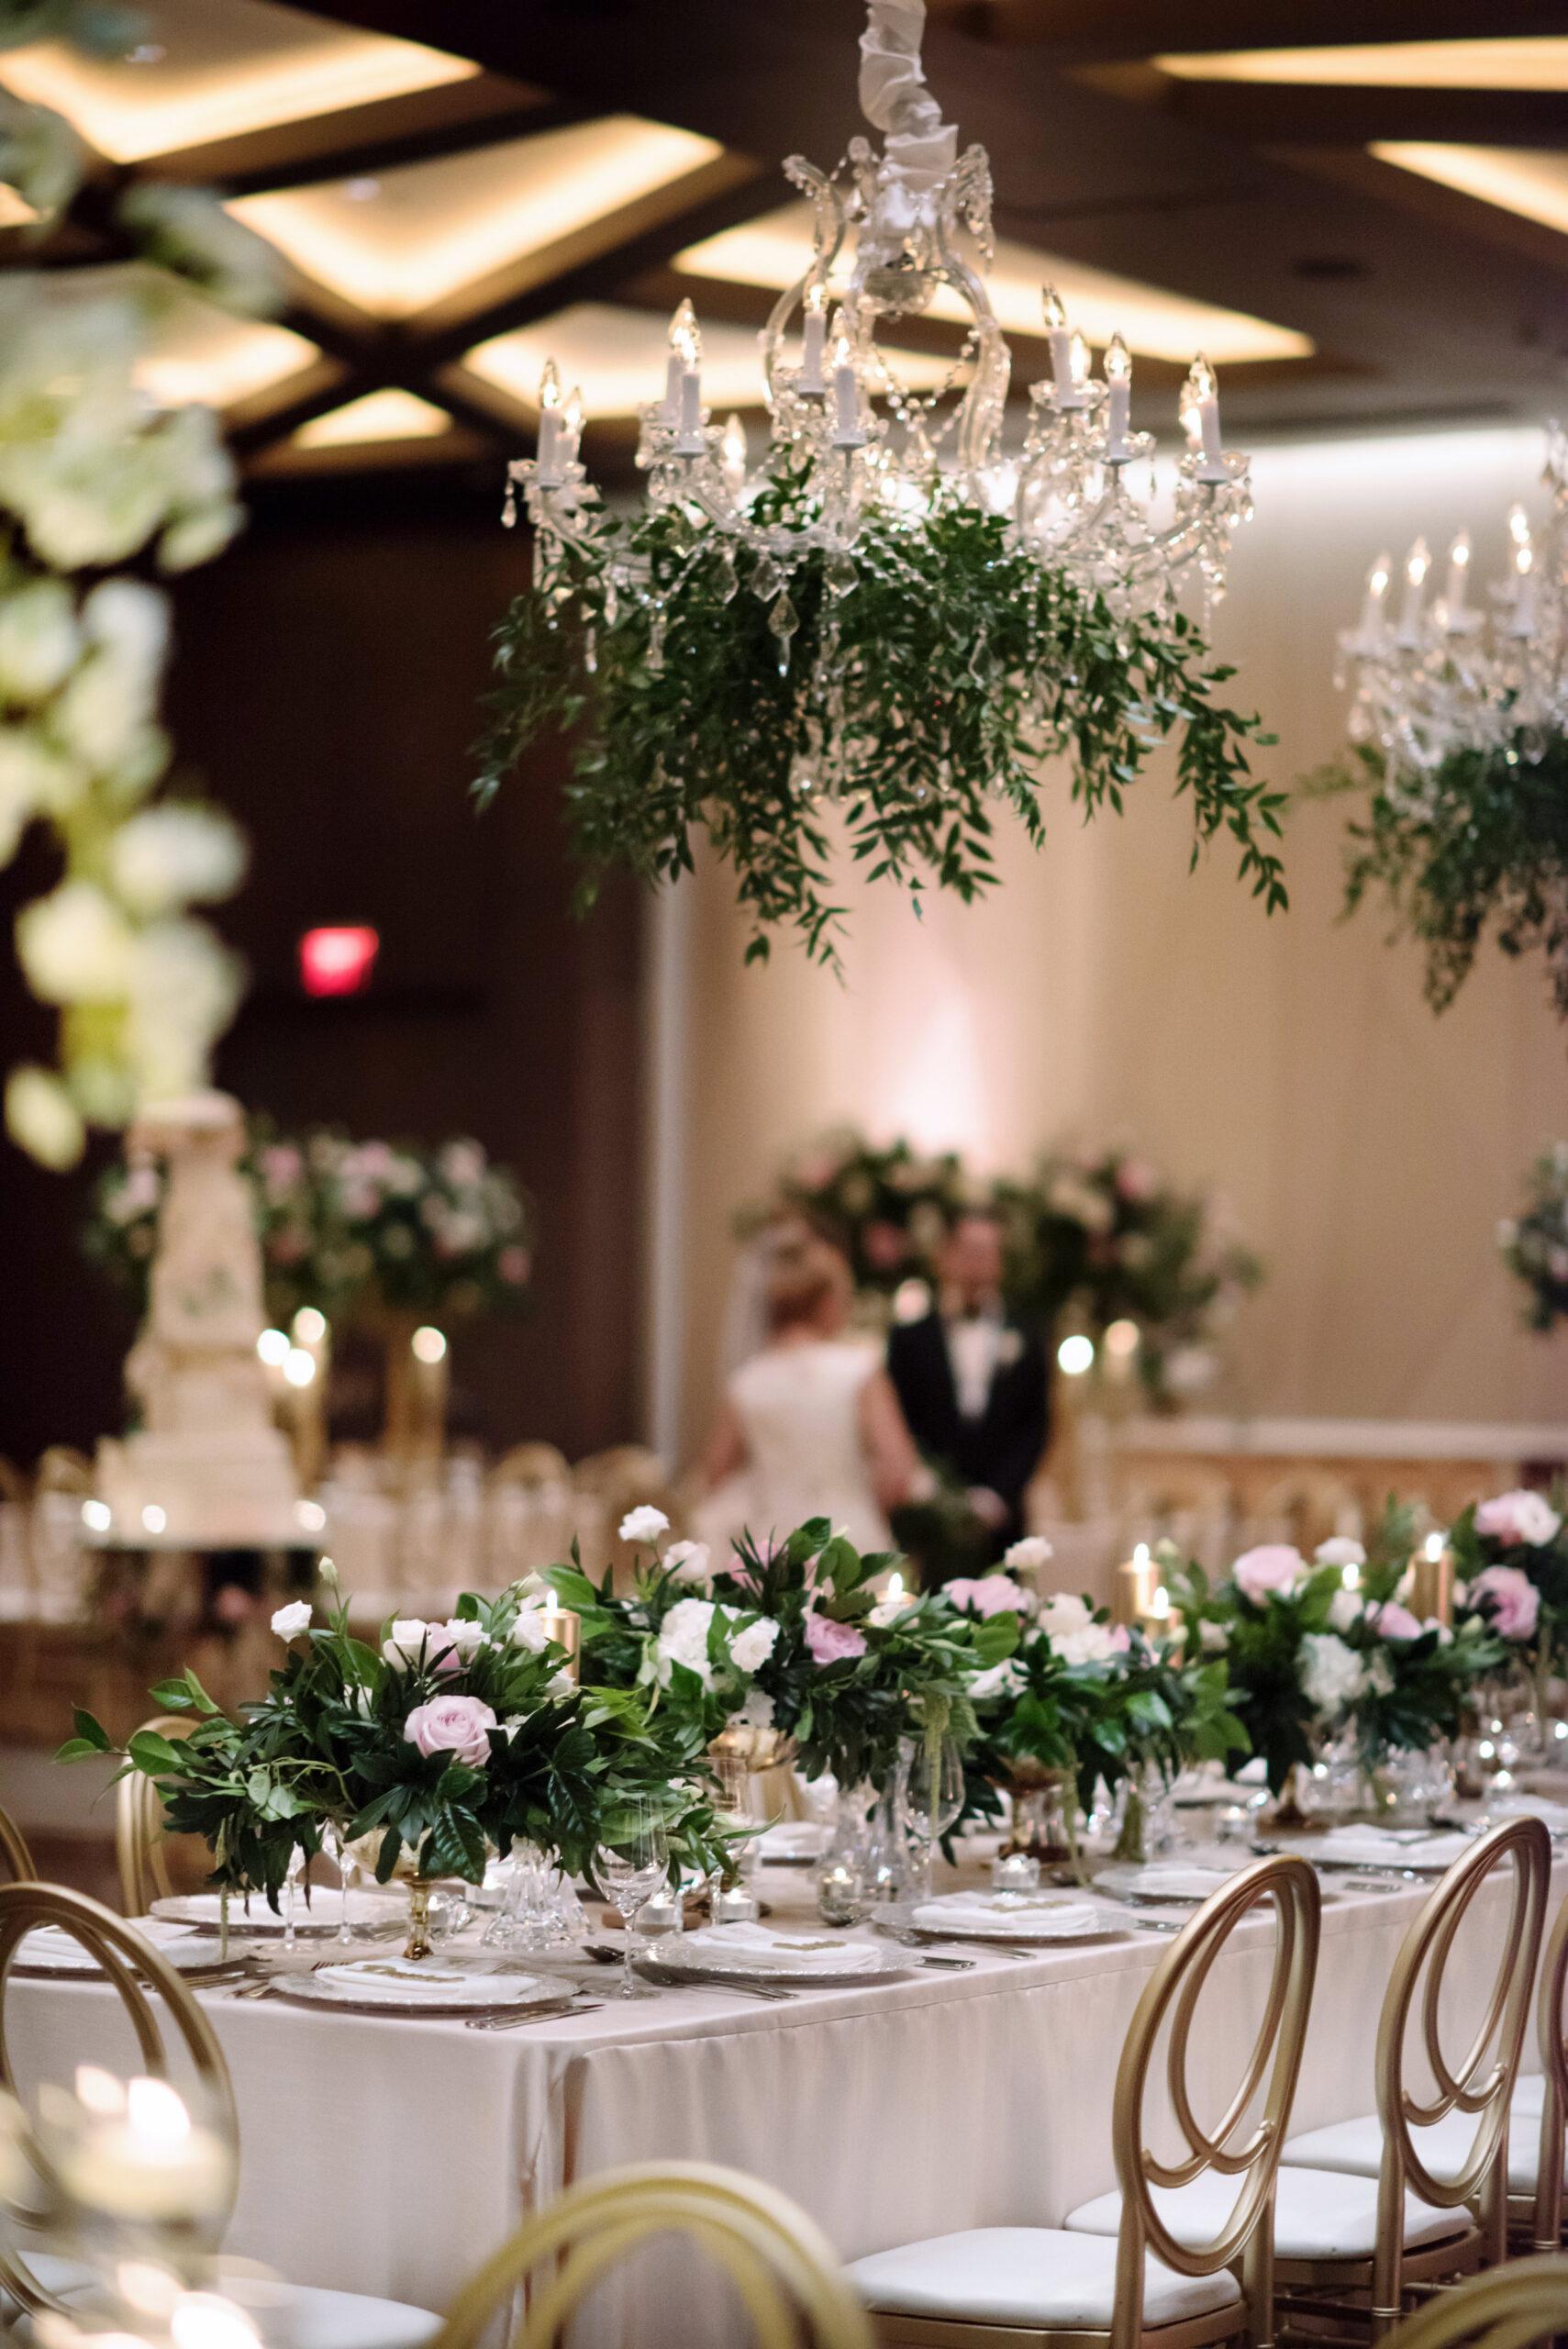 https://secureservercdn.net/45.40.145.151/kgq.ab5.myftpupload.com/wp-content/uploads/2020/04/Sanam-Soroush-s-Wedding-wedluxe-submission-0076-scaled.jpg?time=1634407926